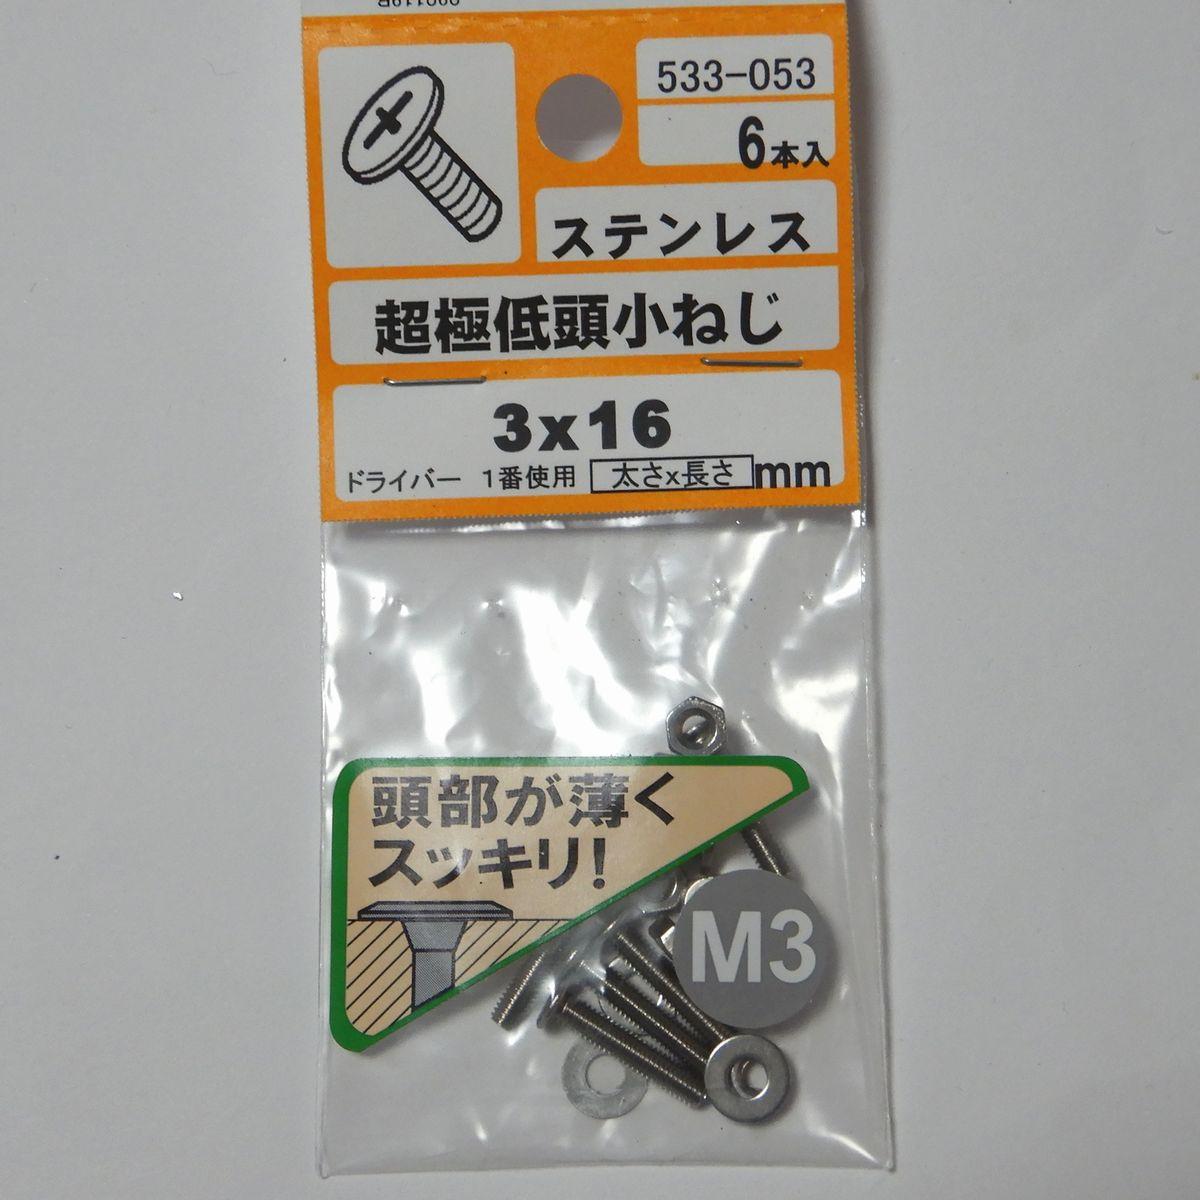 f:id:shiratsume:20190404141046j:plain